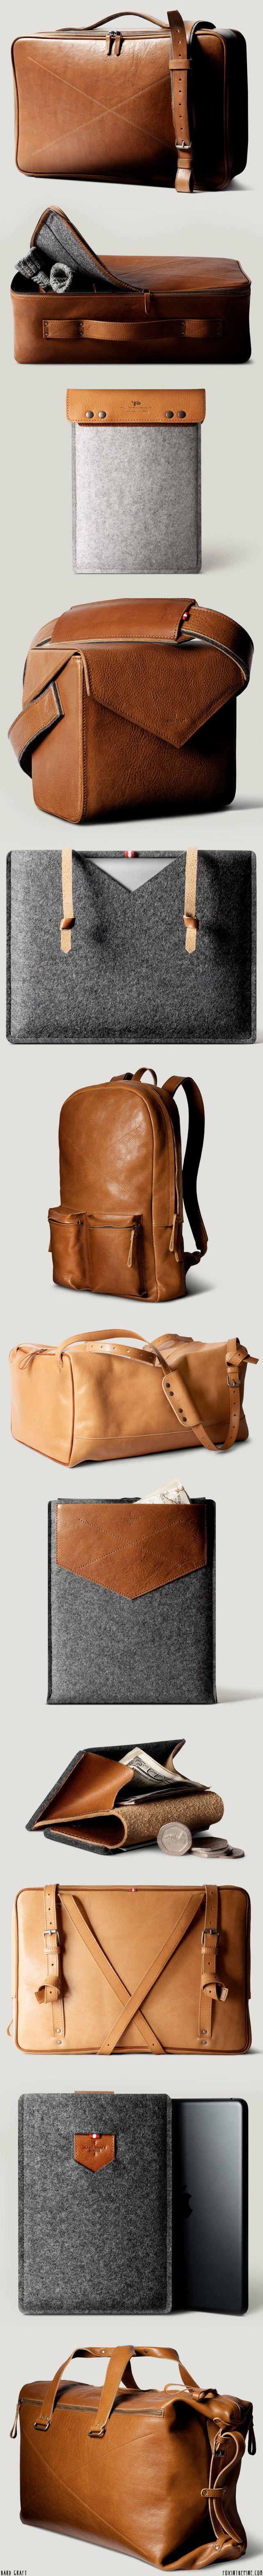 Hard Graft leather and felt goods   //   FOXINTHEPINE.COM